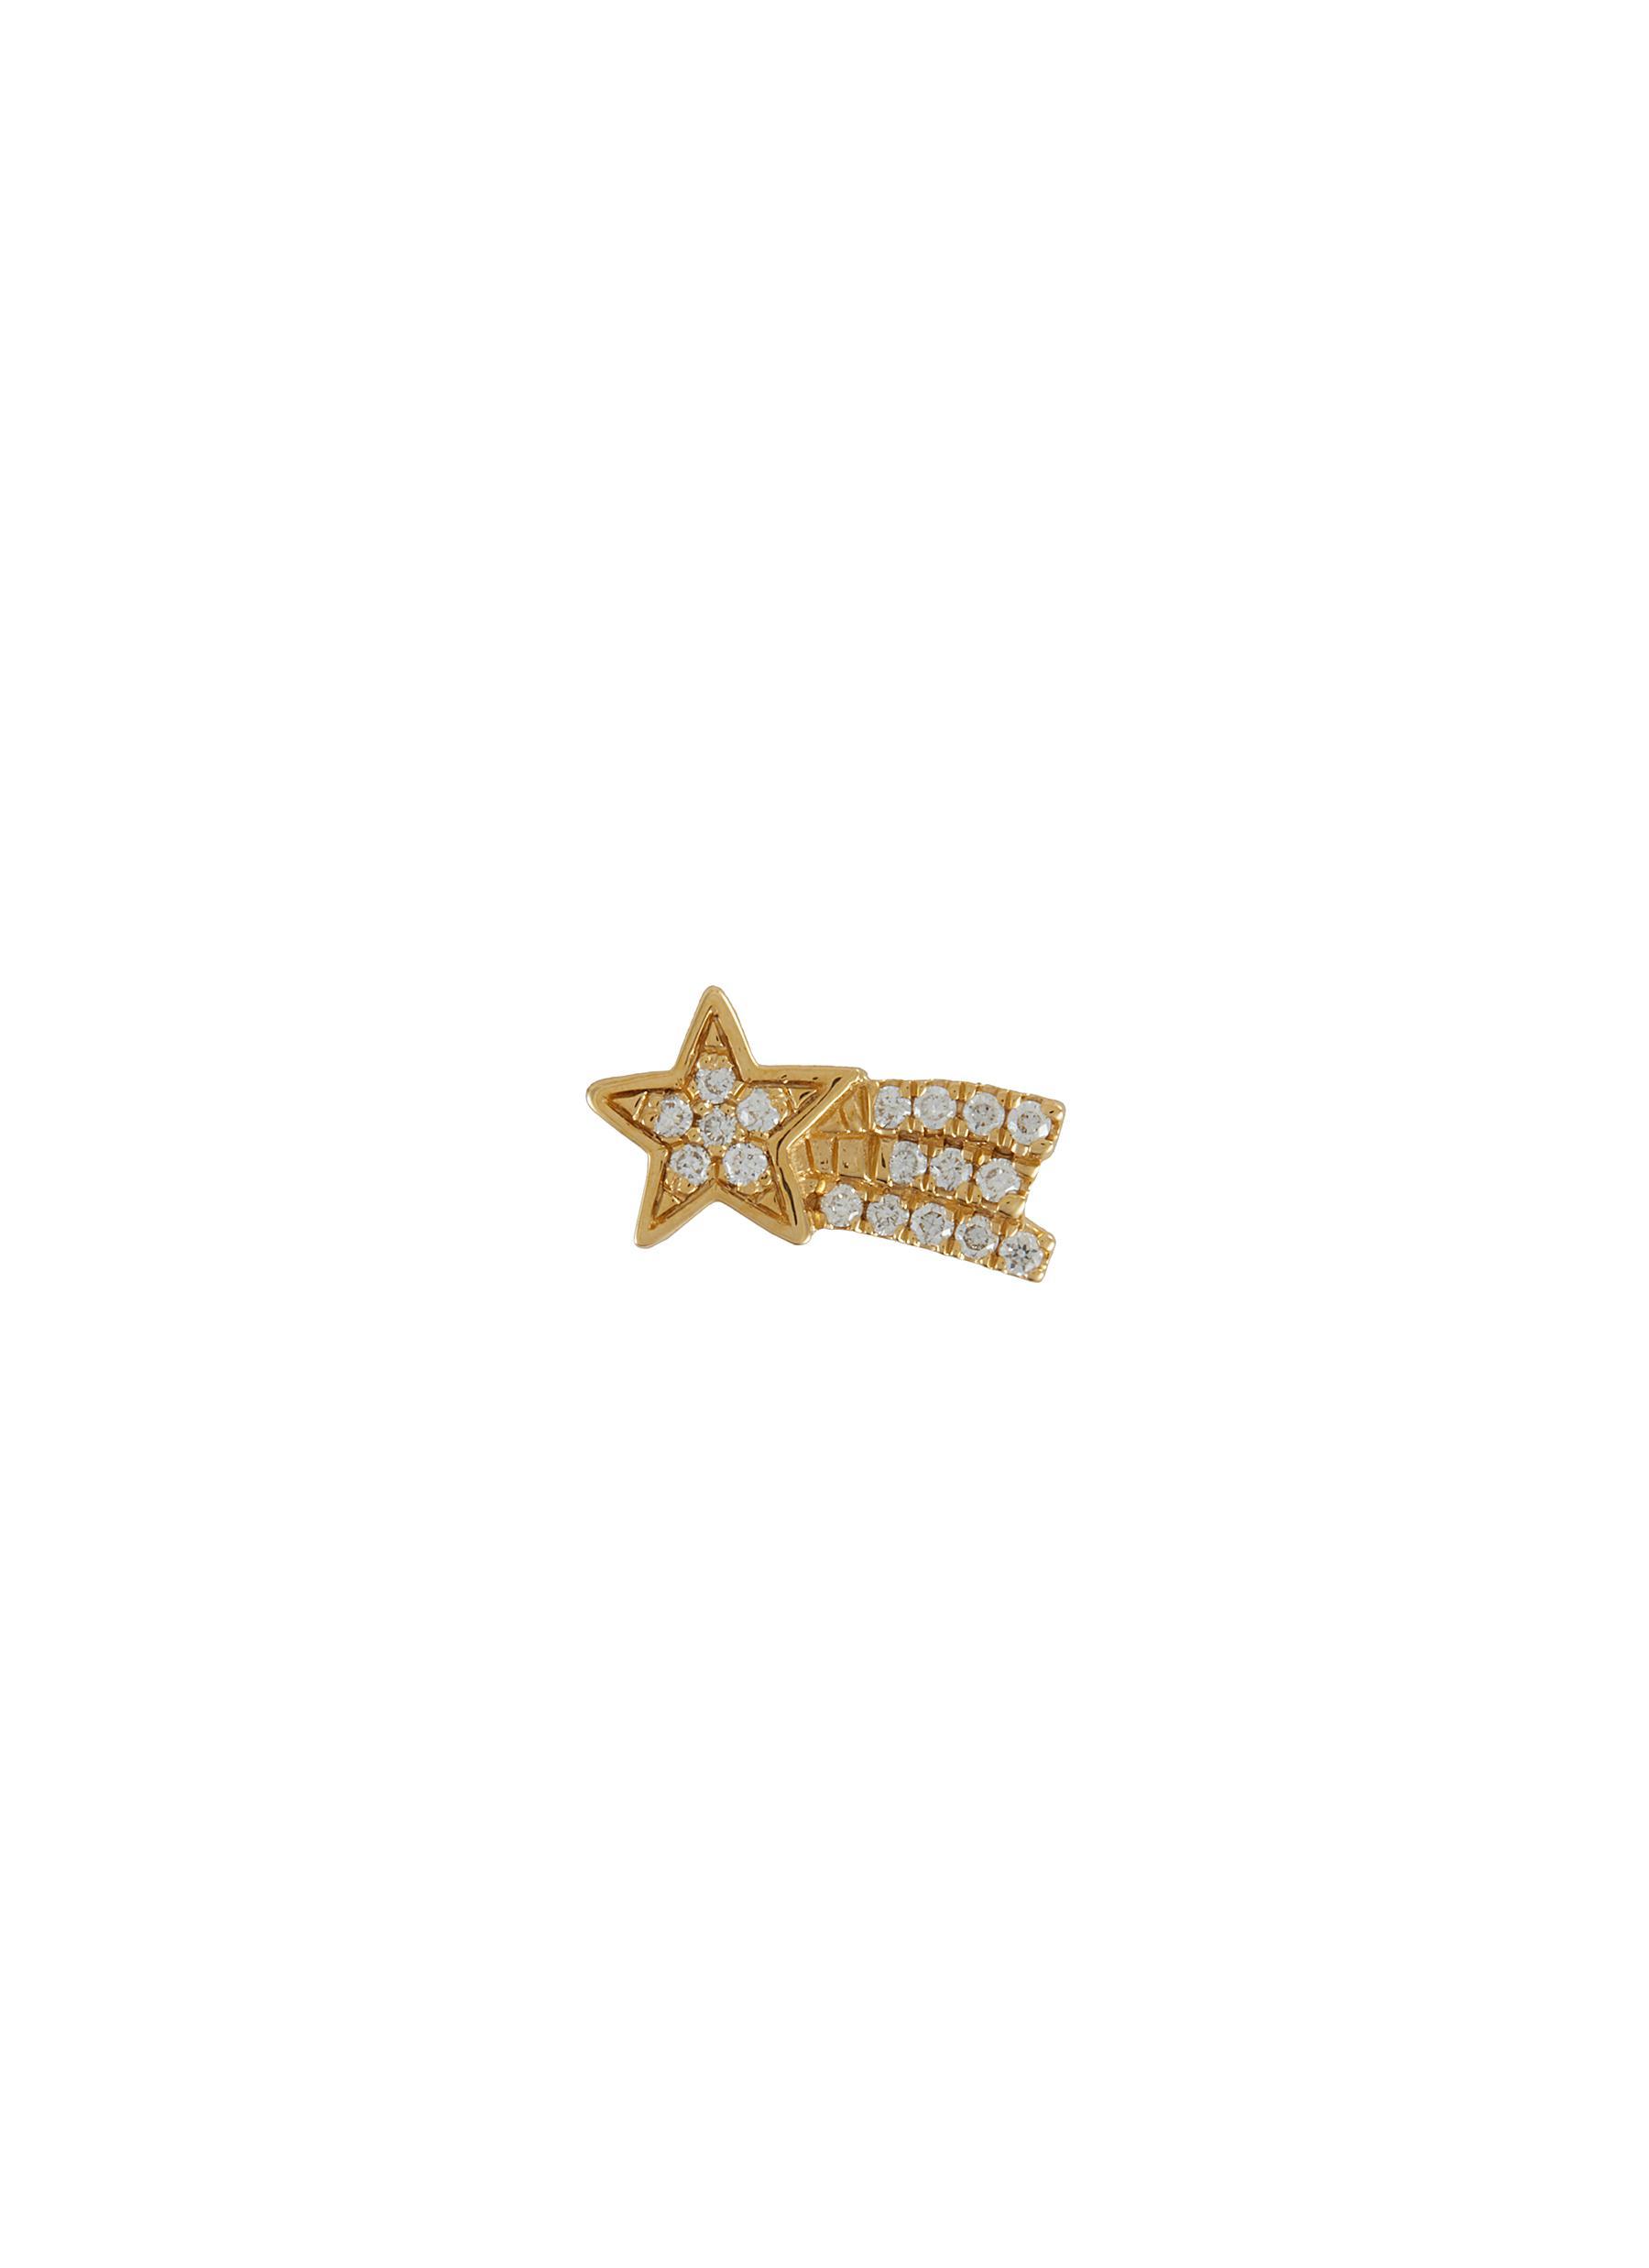 Shooting Star Diamond 18k Yellow Gold Charm